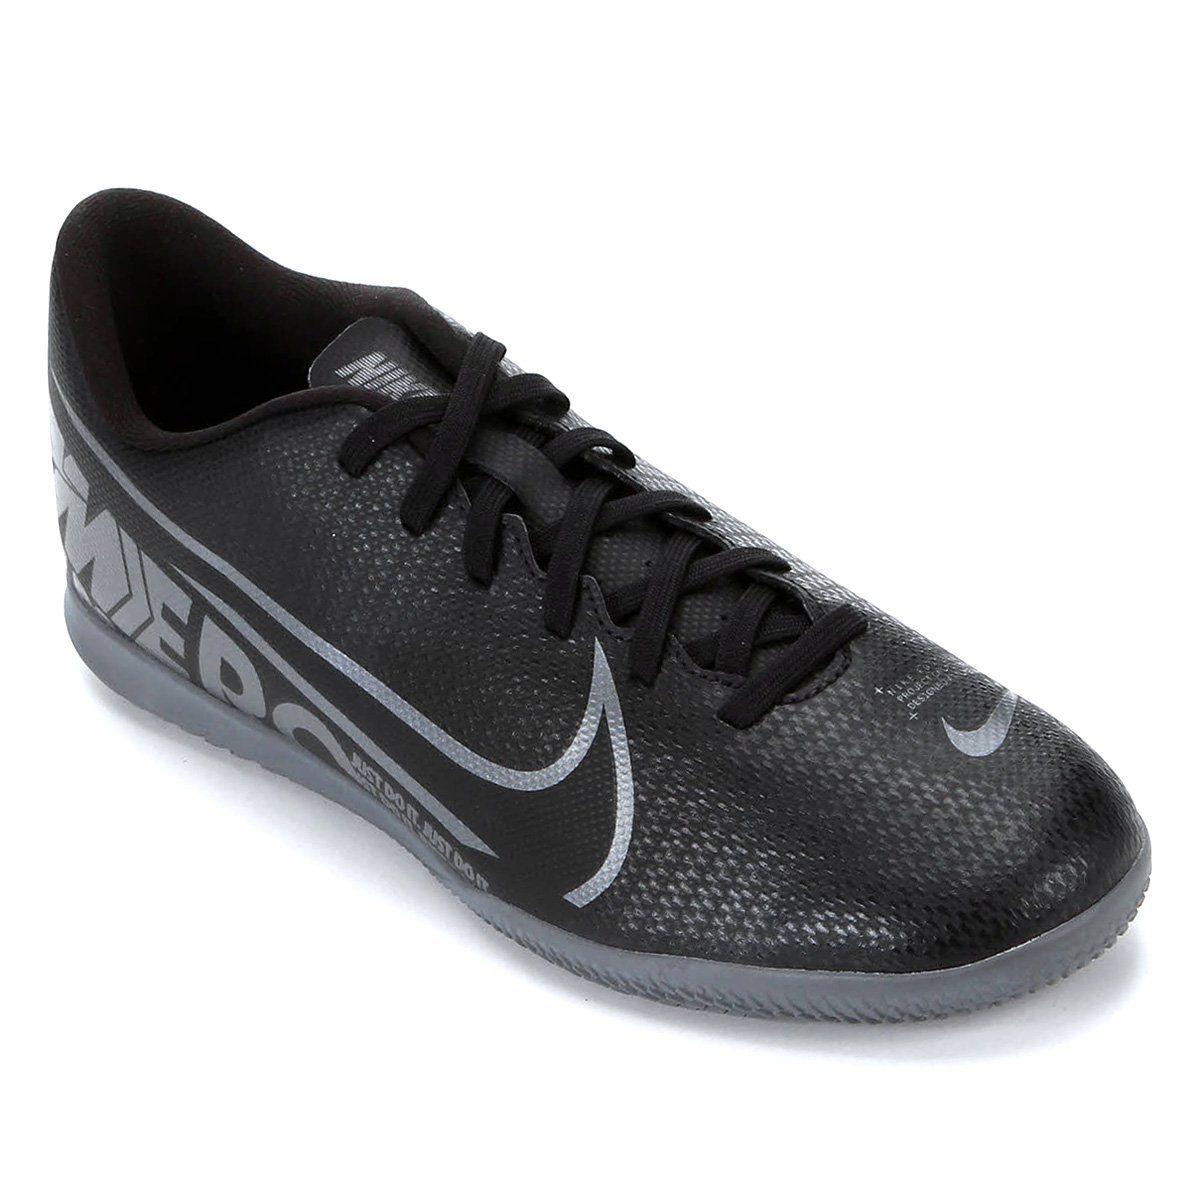 Chuteira Nike Futsal Mercurial Vapor 13 - At7997-001